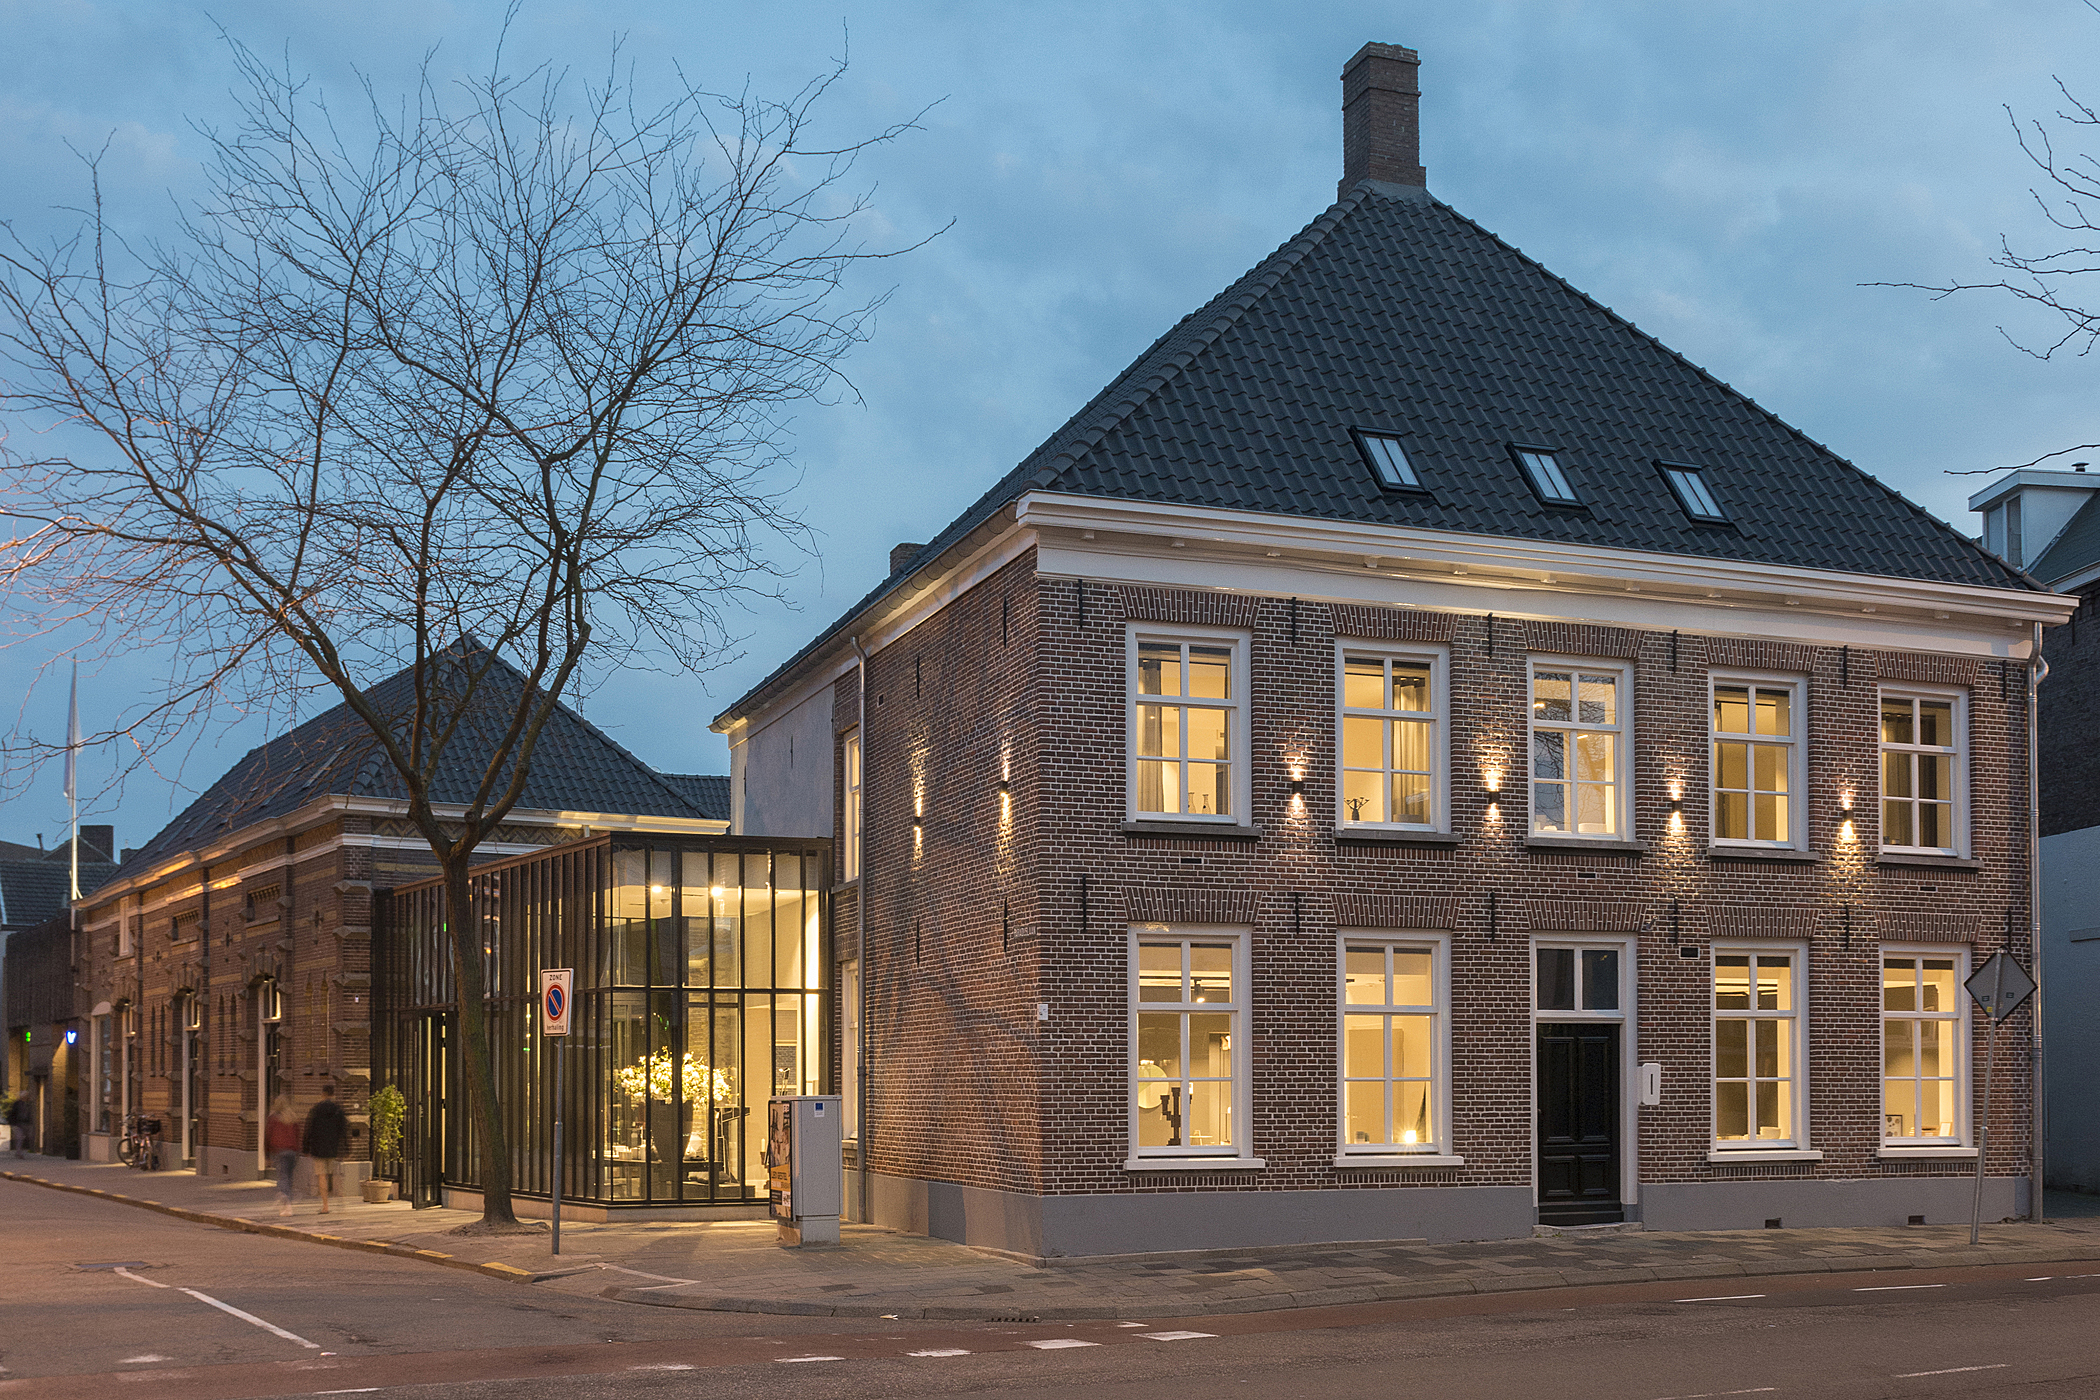 Kazerne Main Building Image Ruud Balk